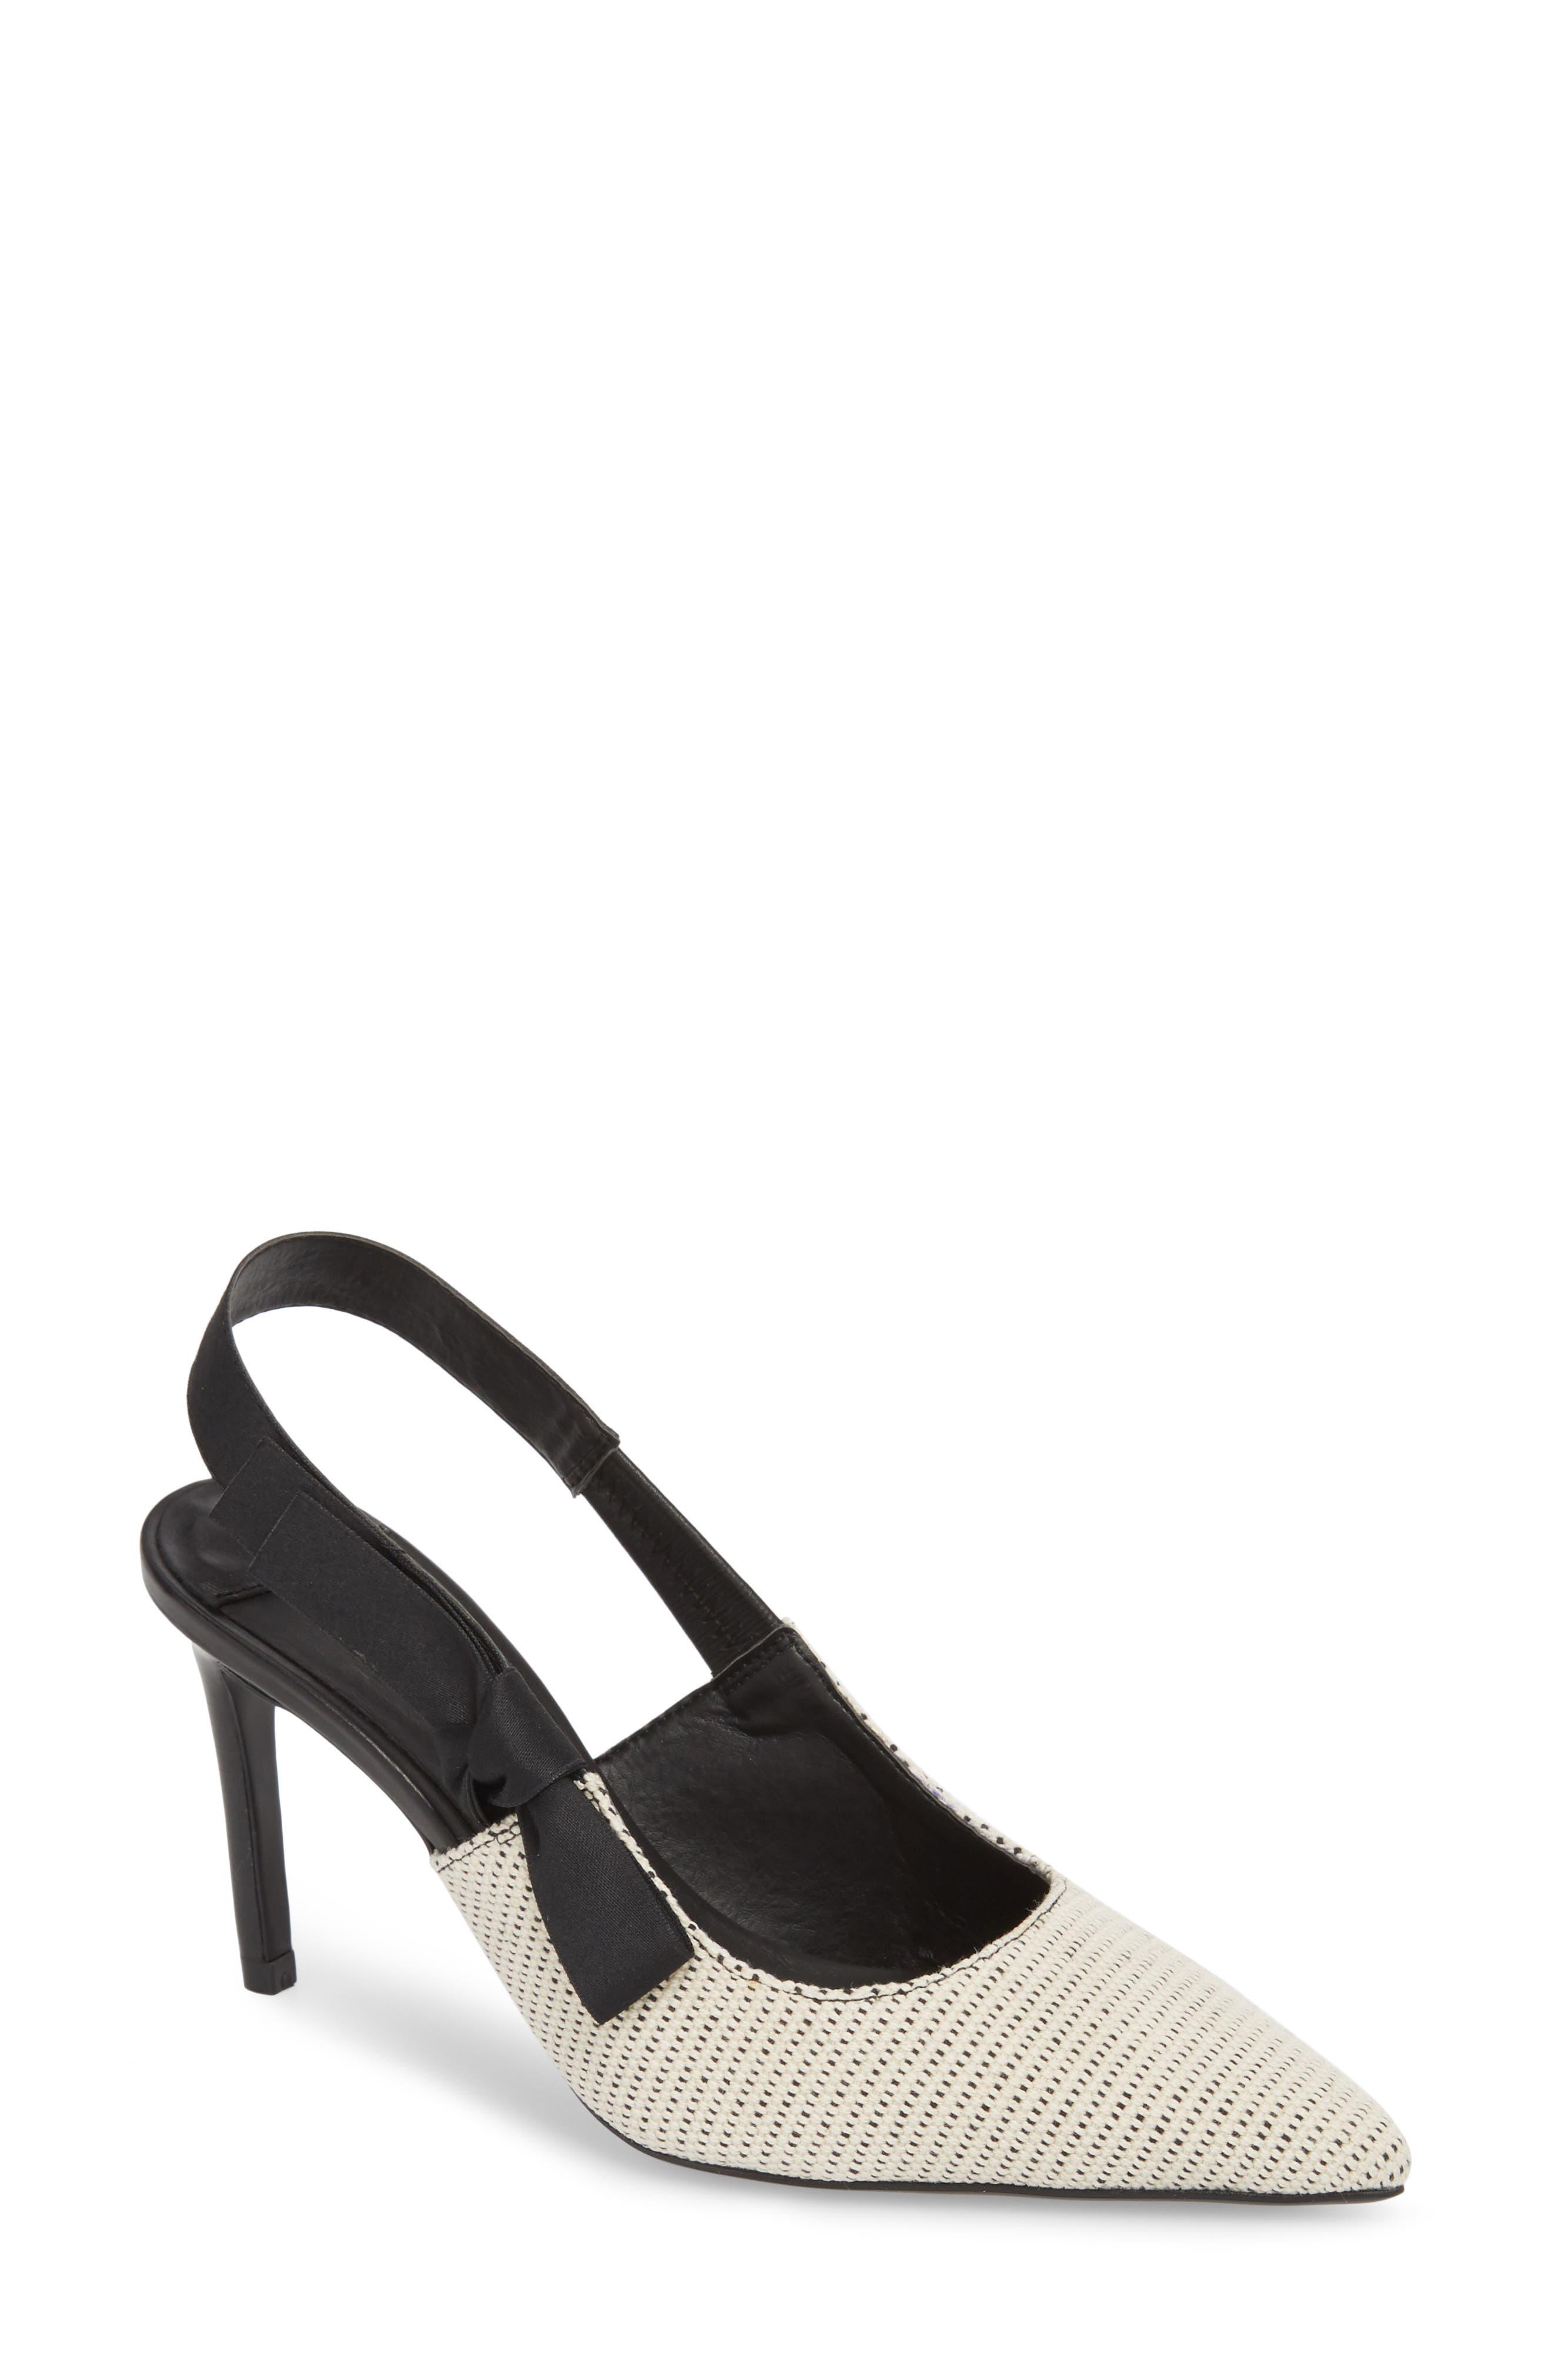 Evita Sandal,                         Main,                         color, WHITE/ BLACK FABRIC